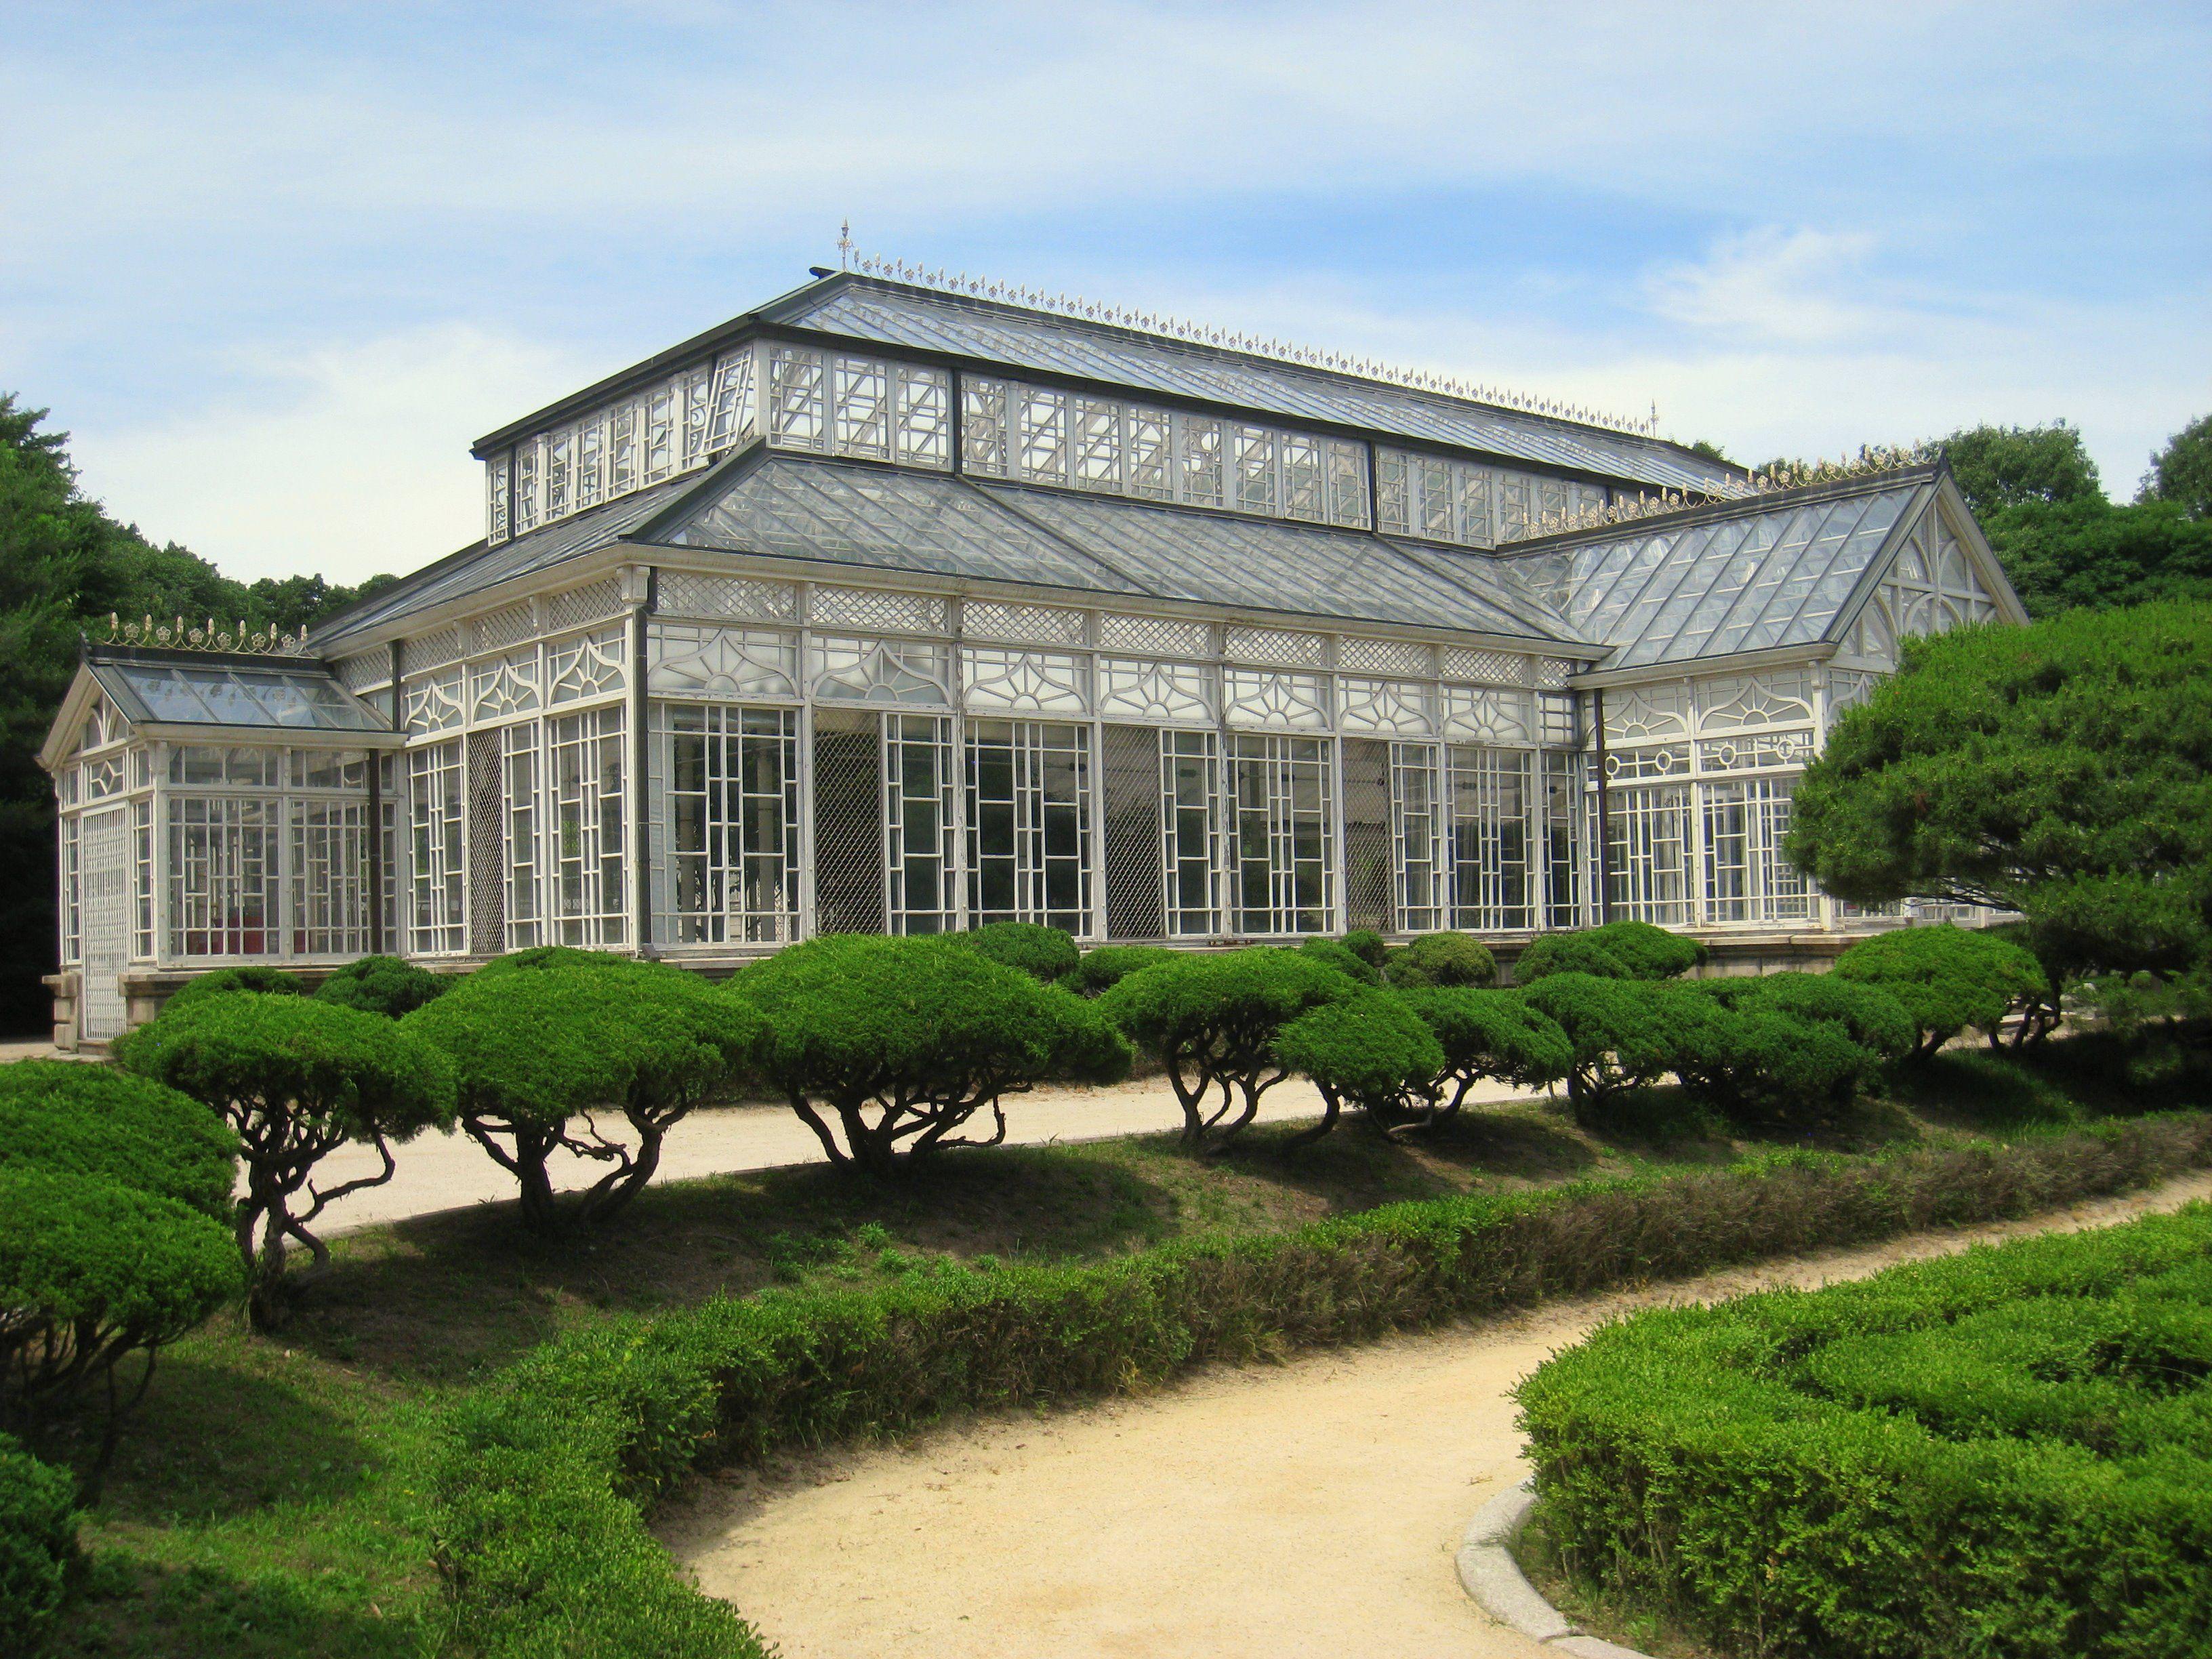 1000 images about rchitecture glass pavilion